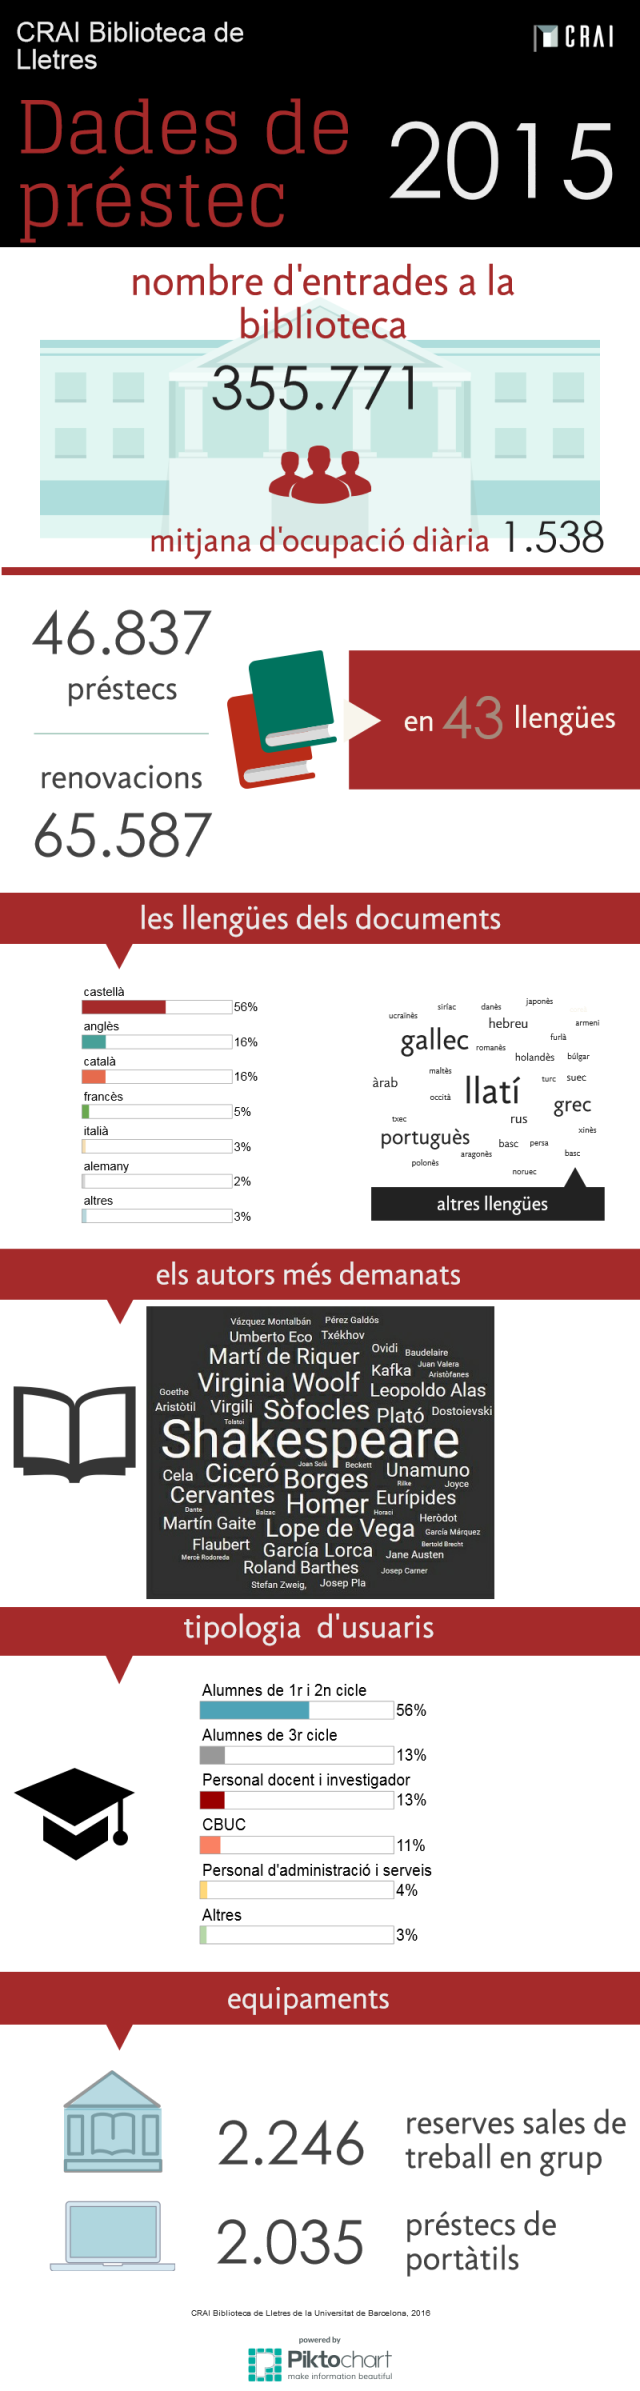 dades-de-prestec-2015-crai-ub-biblioteca-de-lletres